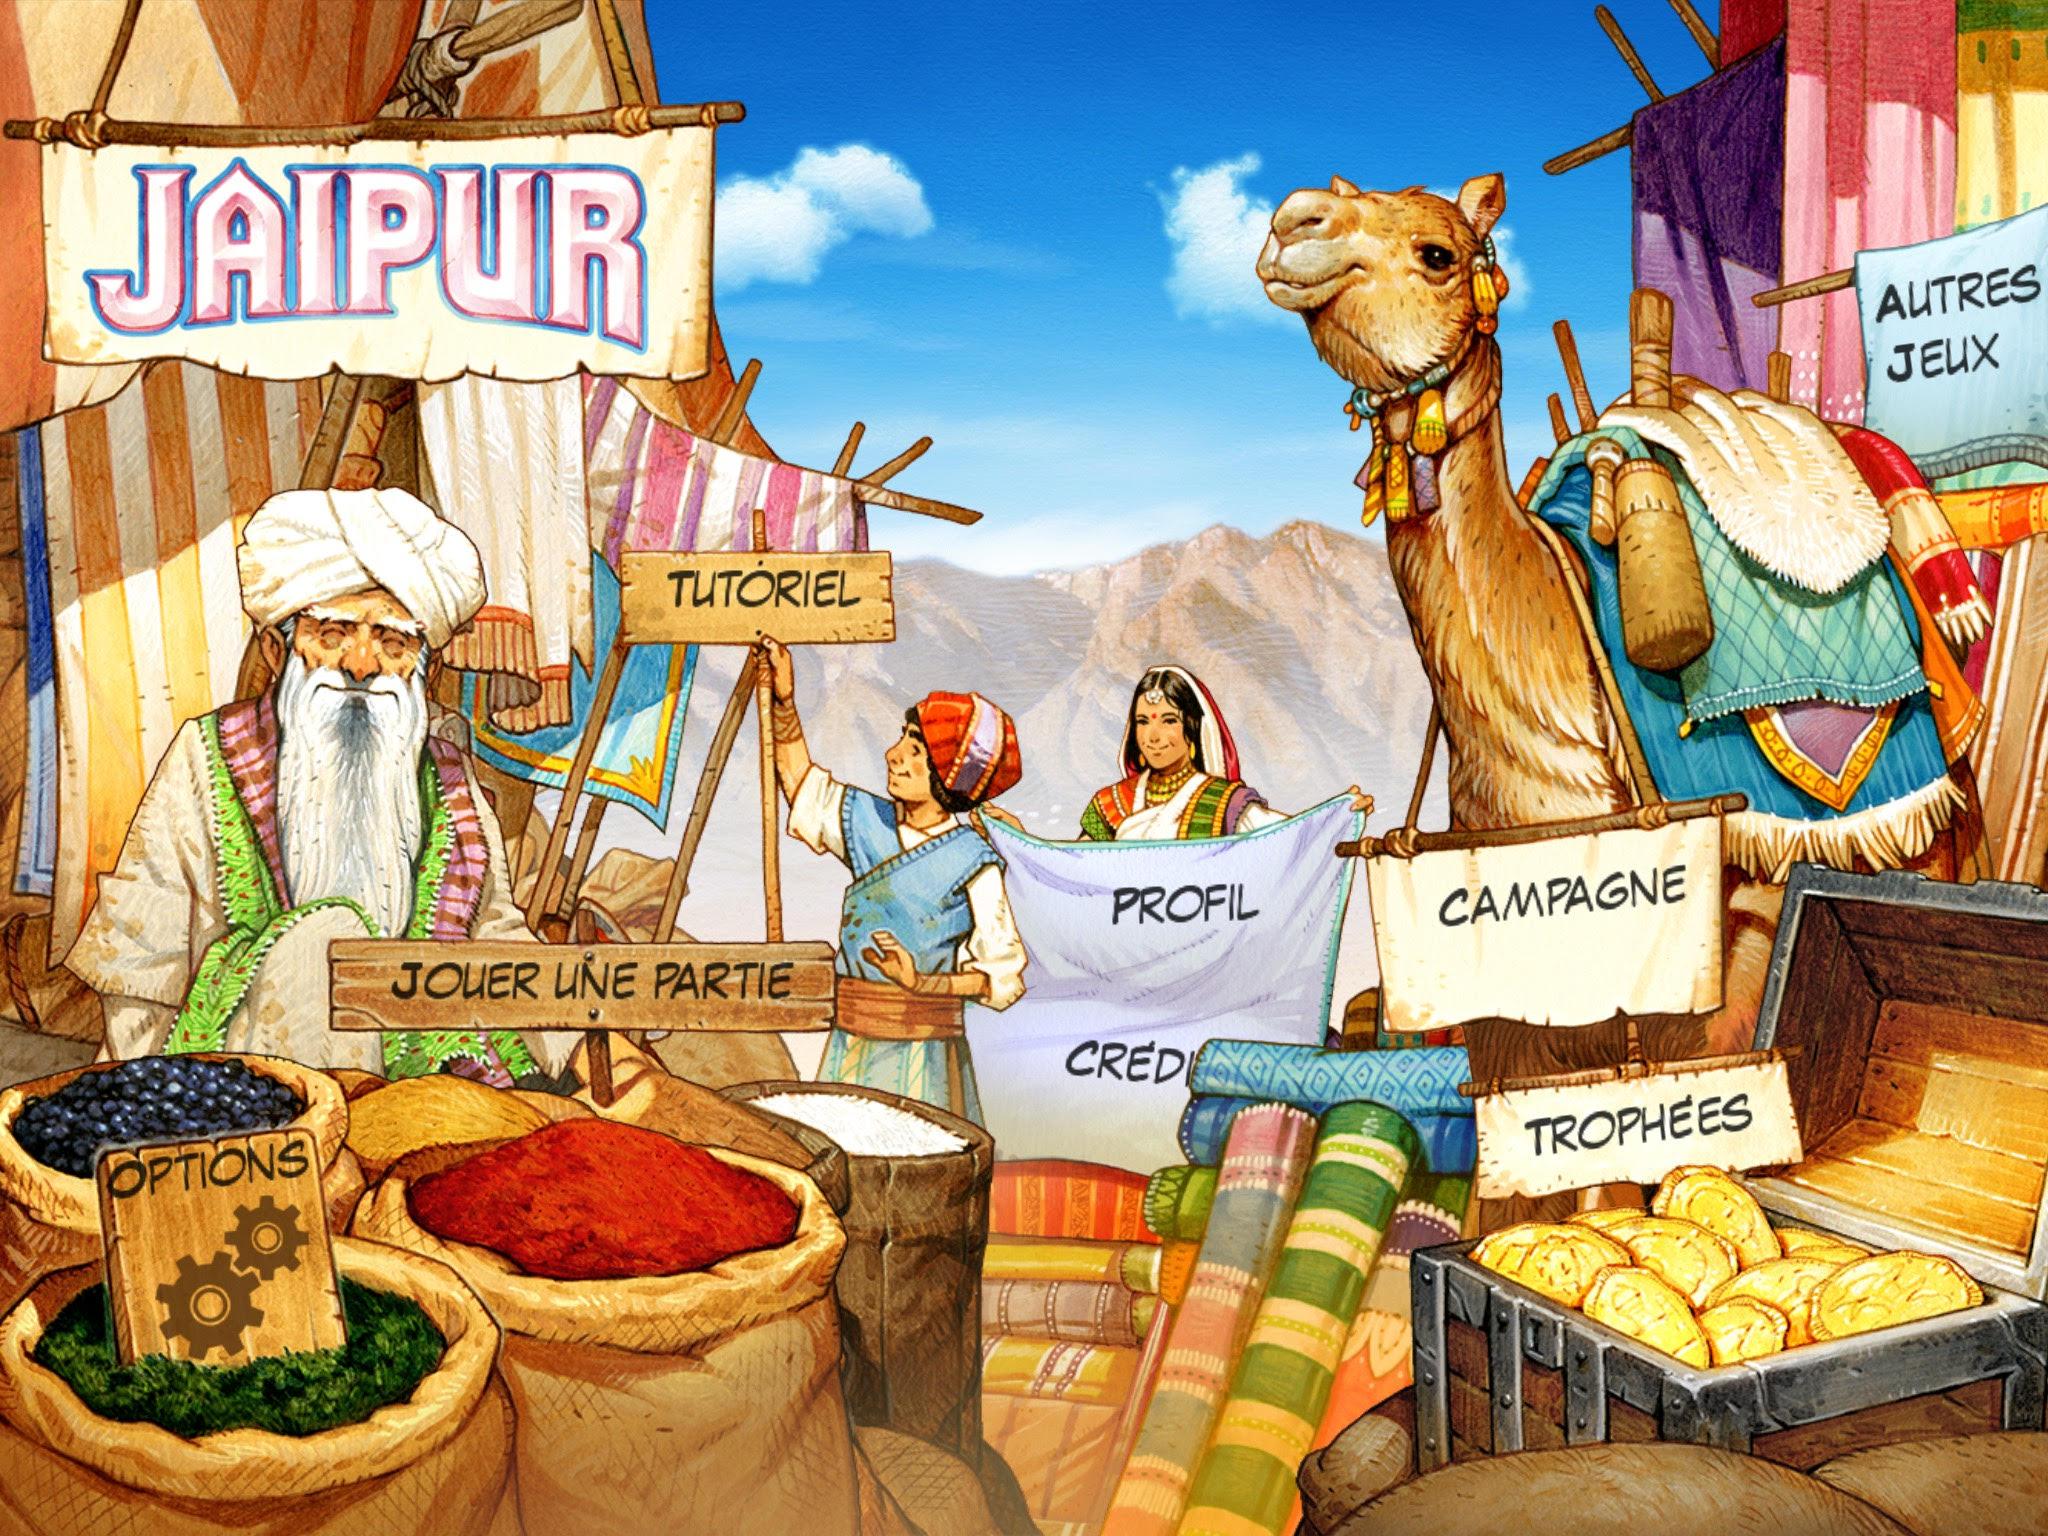 Luxury Jeuxfr Cuisine Suggestion Iqdiplomcom - Jeux fr cuisine